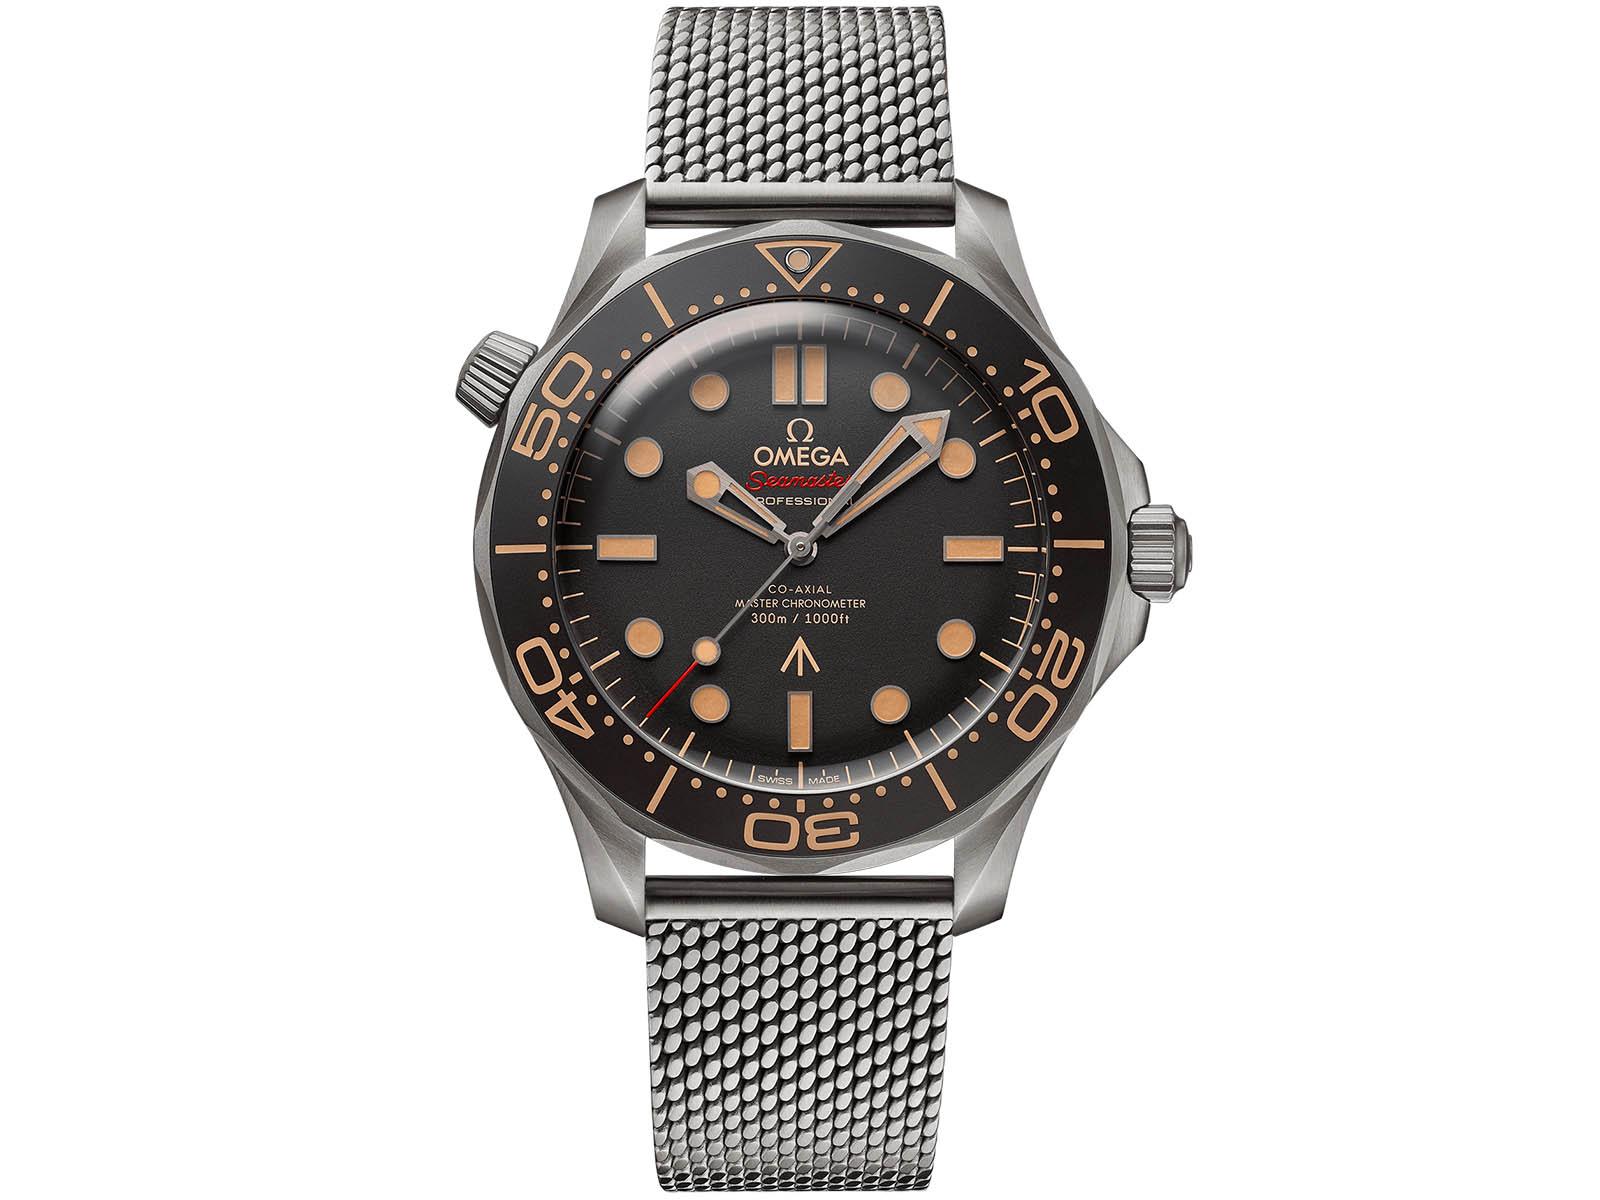 210-90-42-20-01-001-omega-seamaster-diver-300m-007-edition-7.jpg